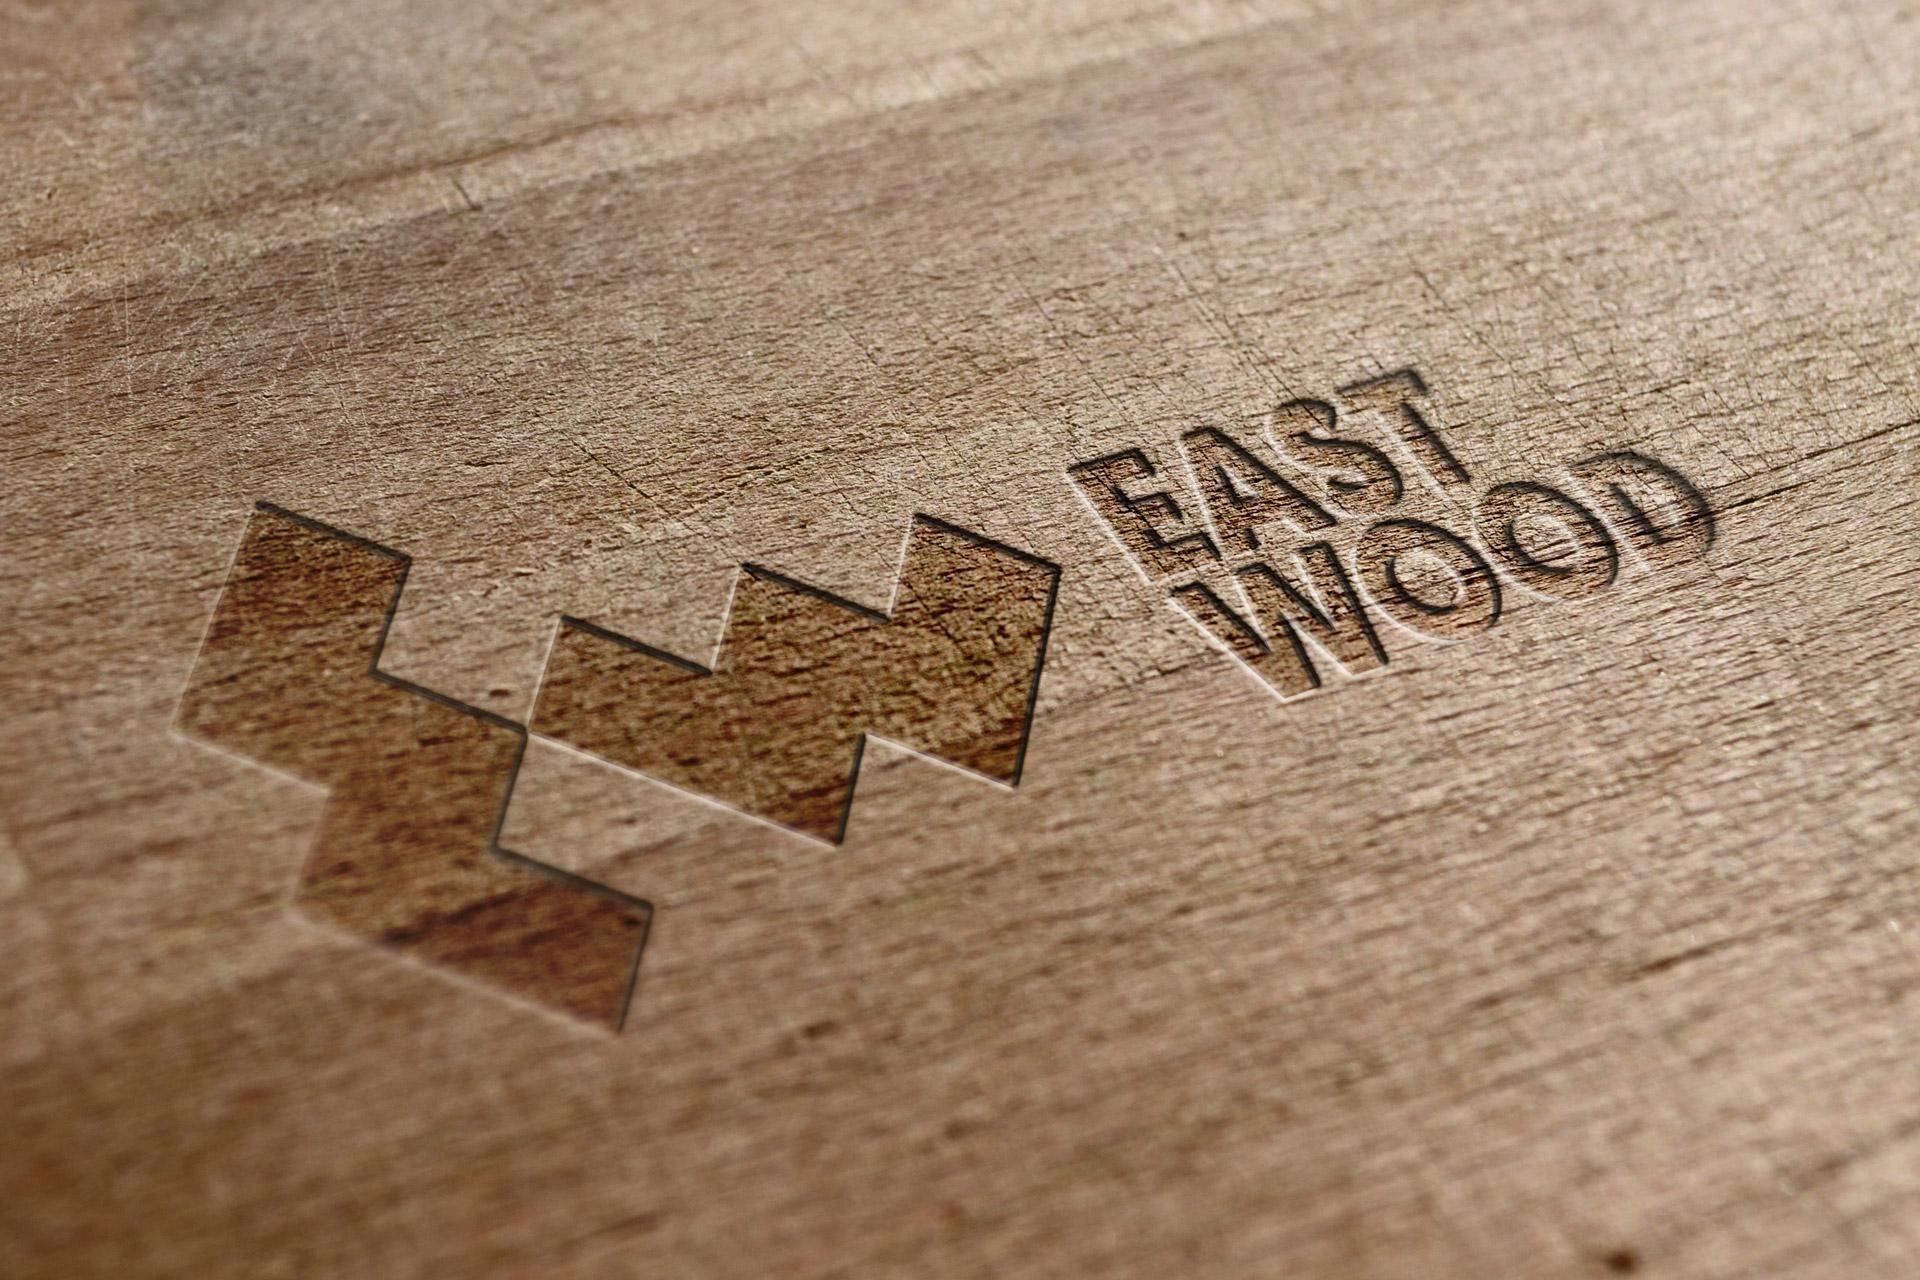 Асгард Брендинг, фирменный стиль, лого, Eastwood, дизайн, лес, дерево